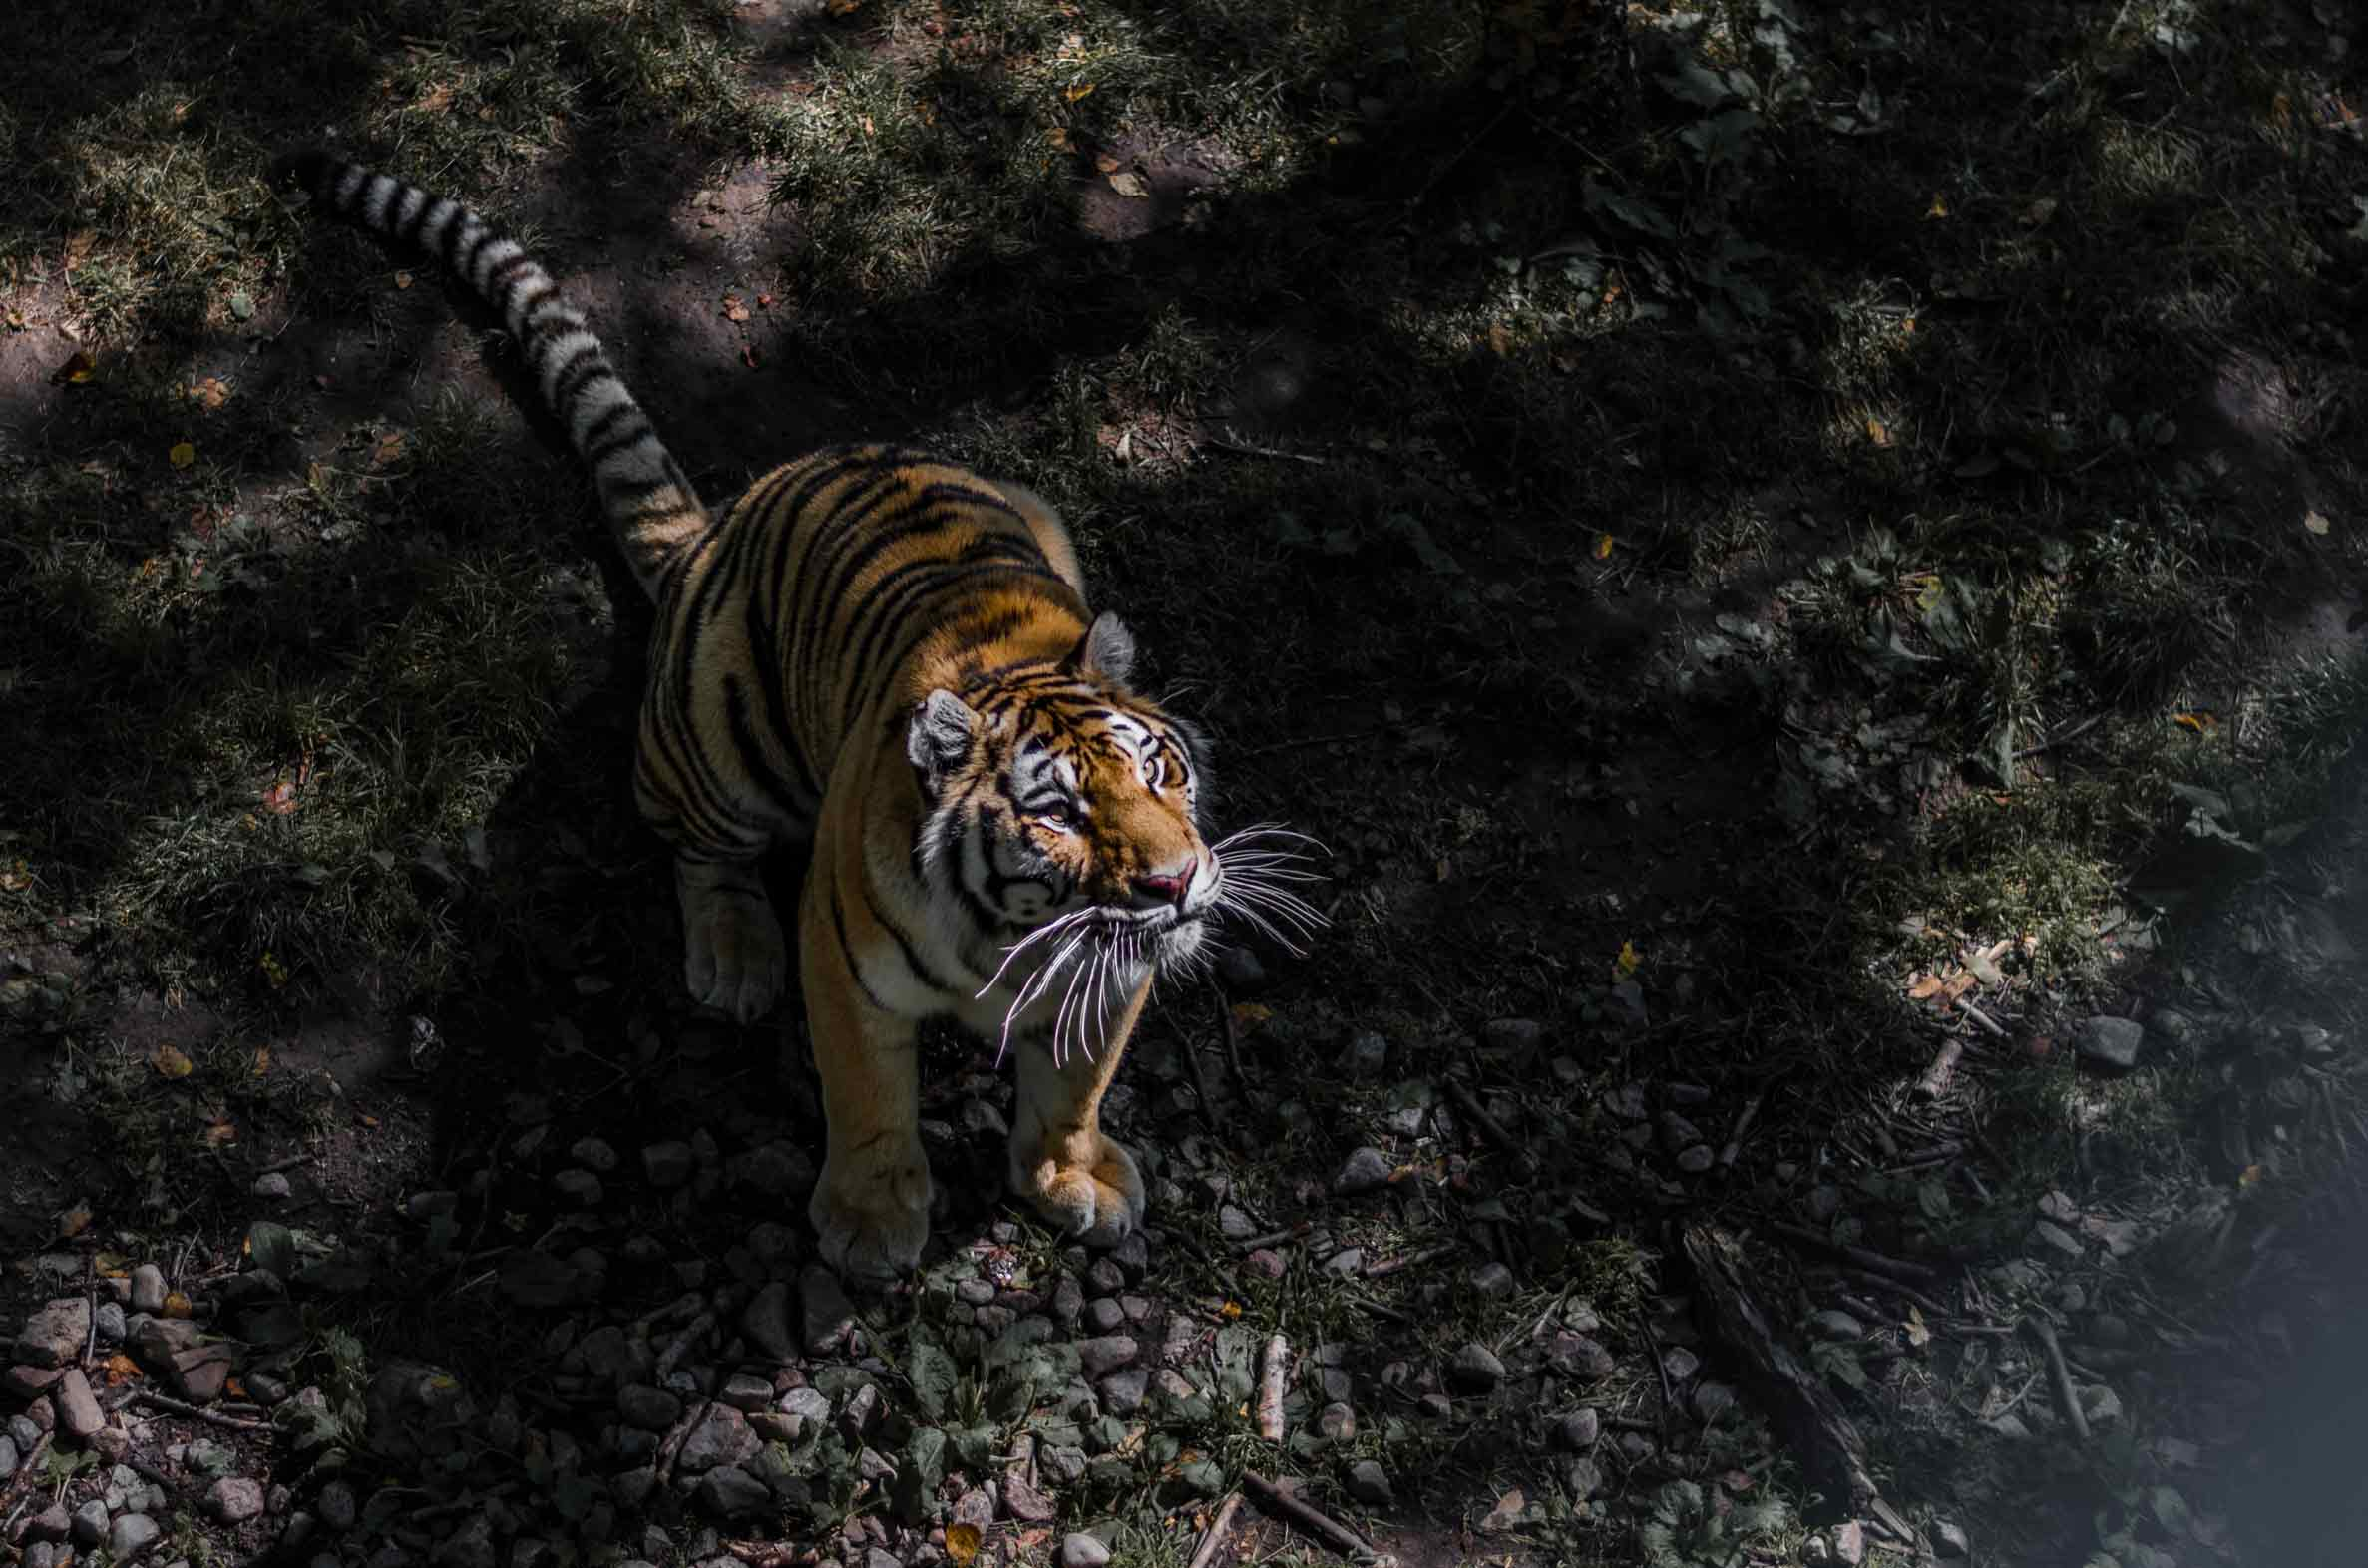 Tigres zoo